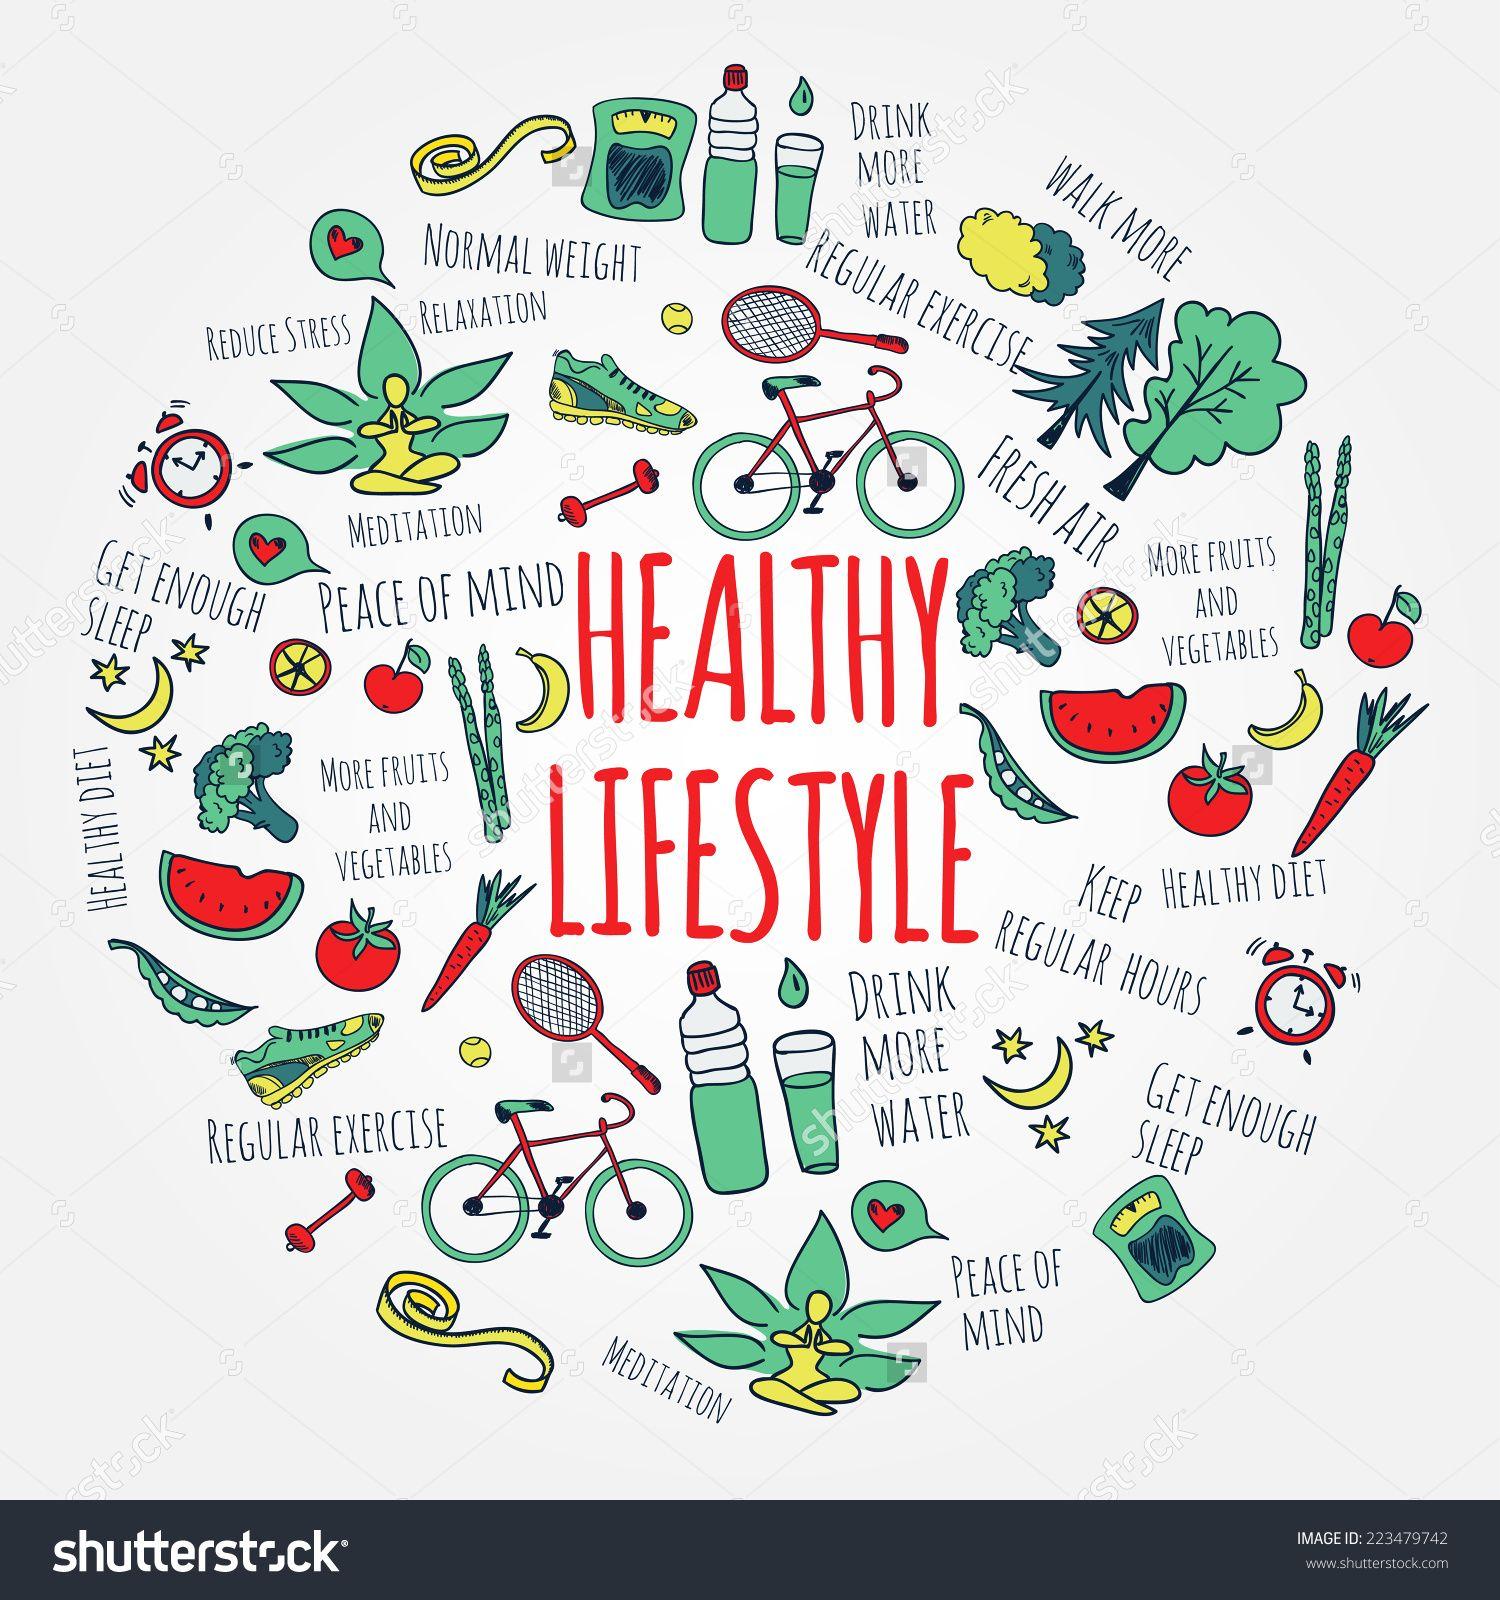 healthylifestyleclipart8.jpg (1500×1600) Healthy